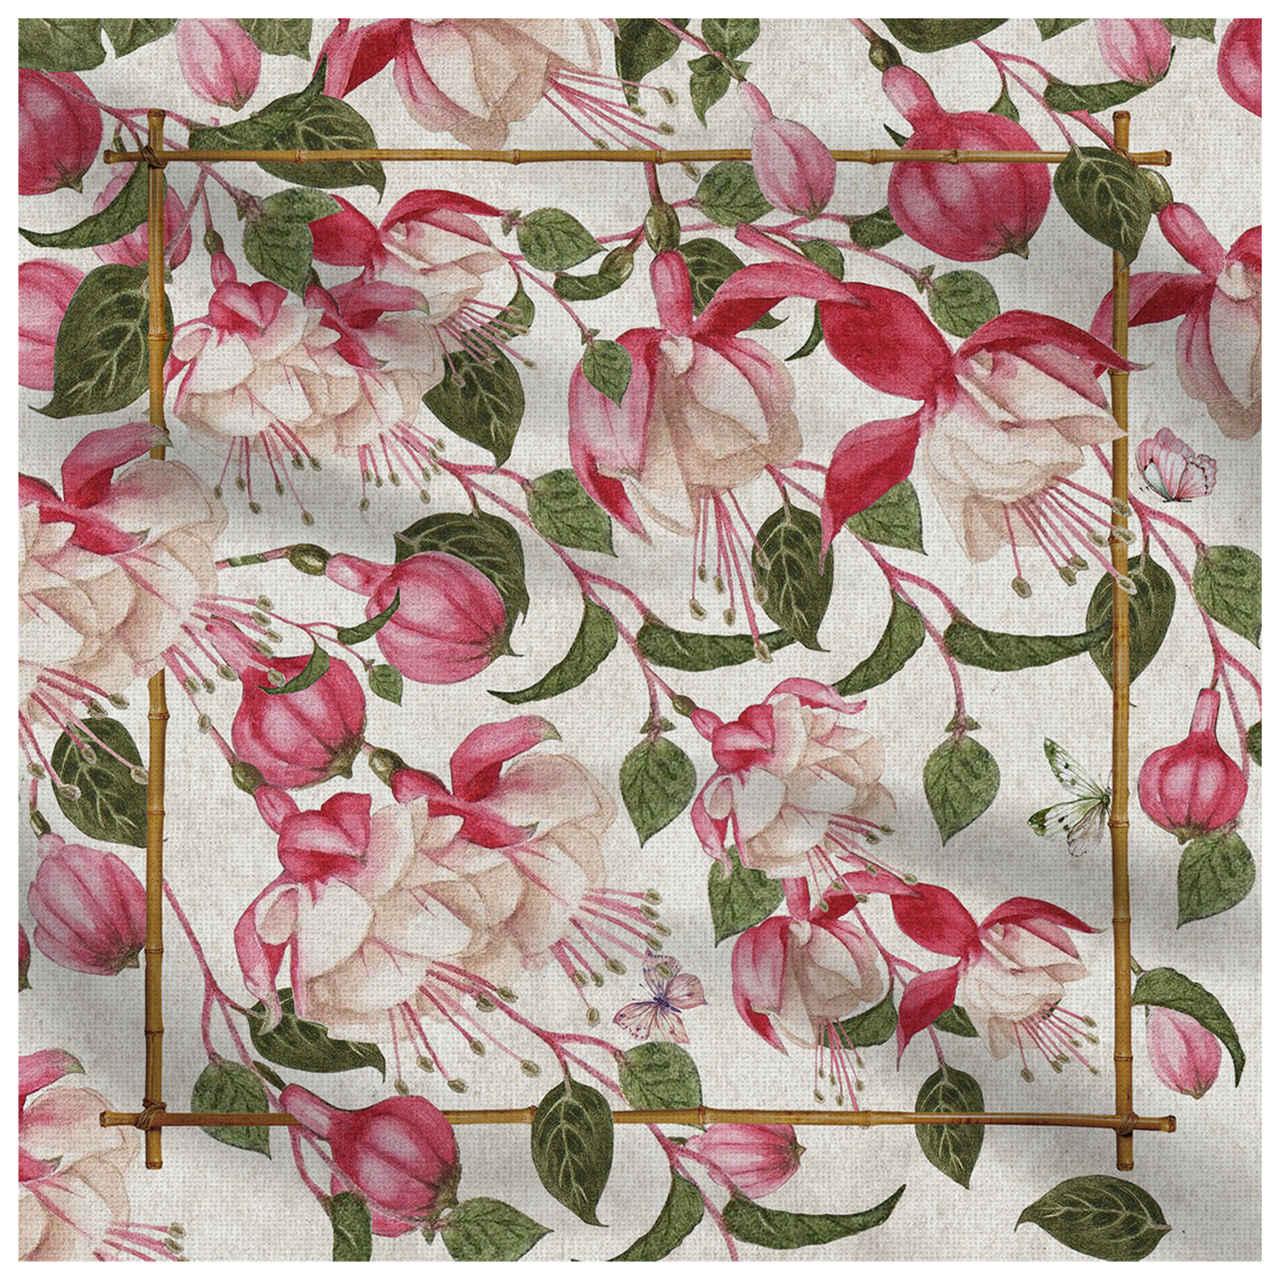 Guardanapo de Linho Fuchsia Flowers (06 Unidades) Cód.: 4120 - MB